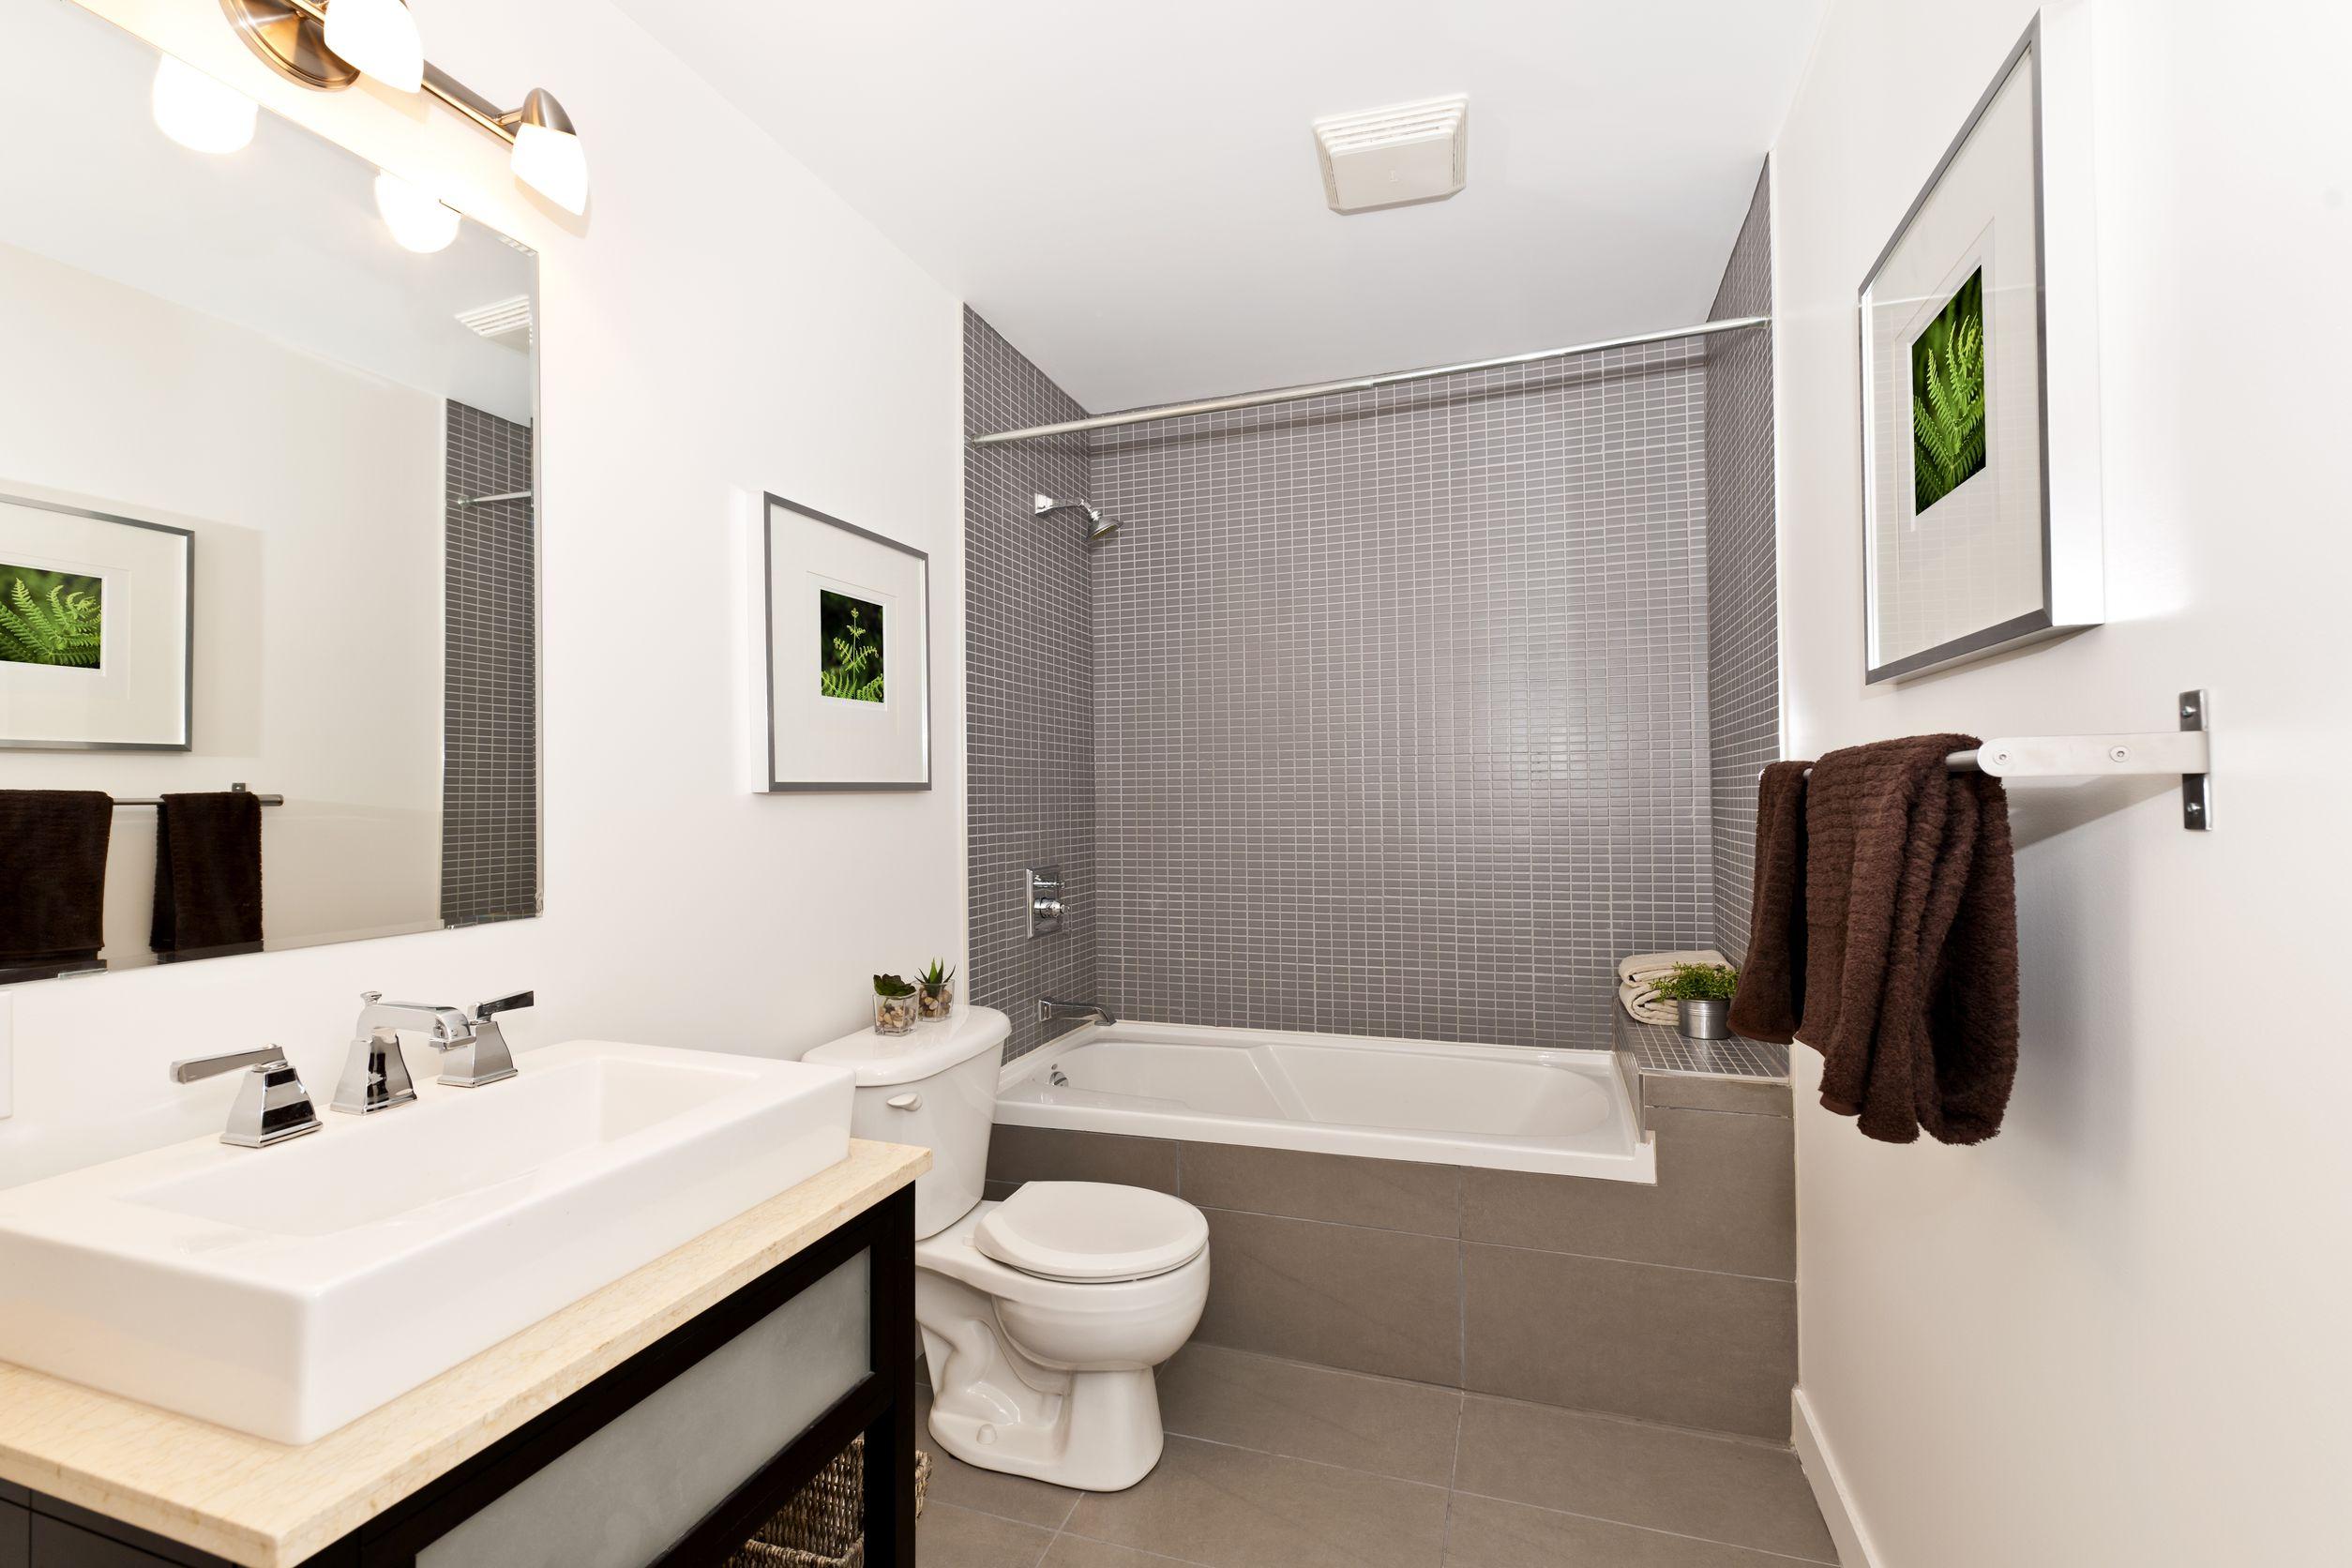 Residential – B. Ayres Plumbing